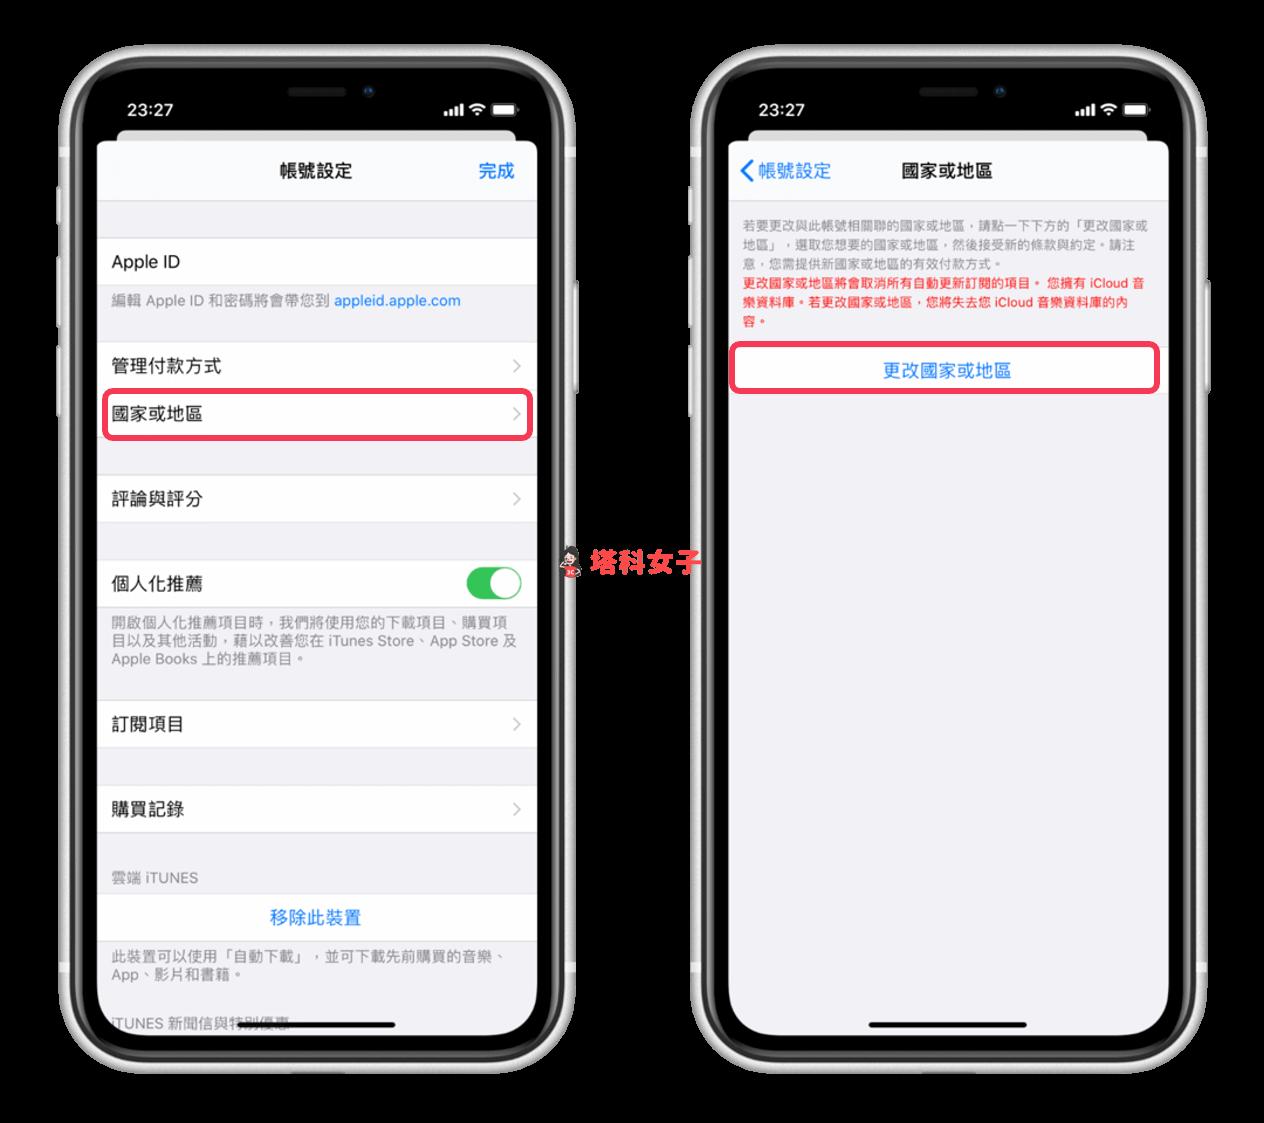 iPhone 跨區下載中國大陸版抖音 (抖音短視頻 App)